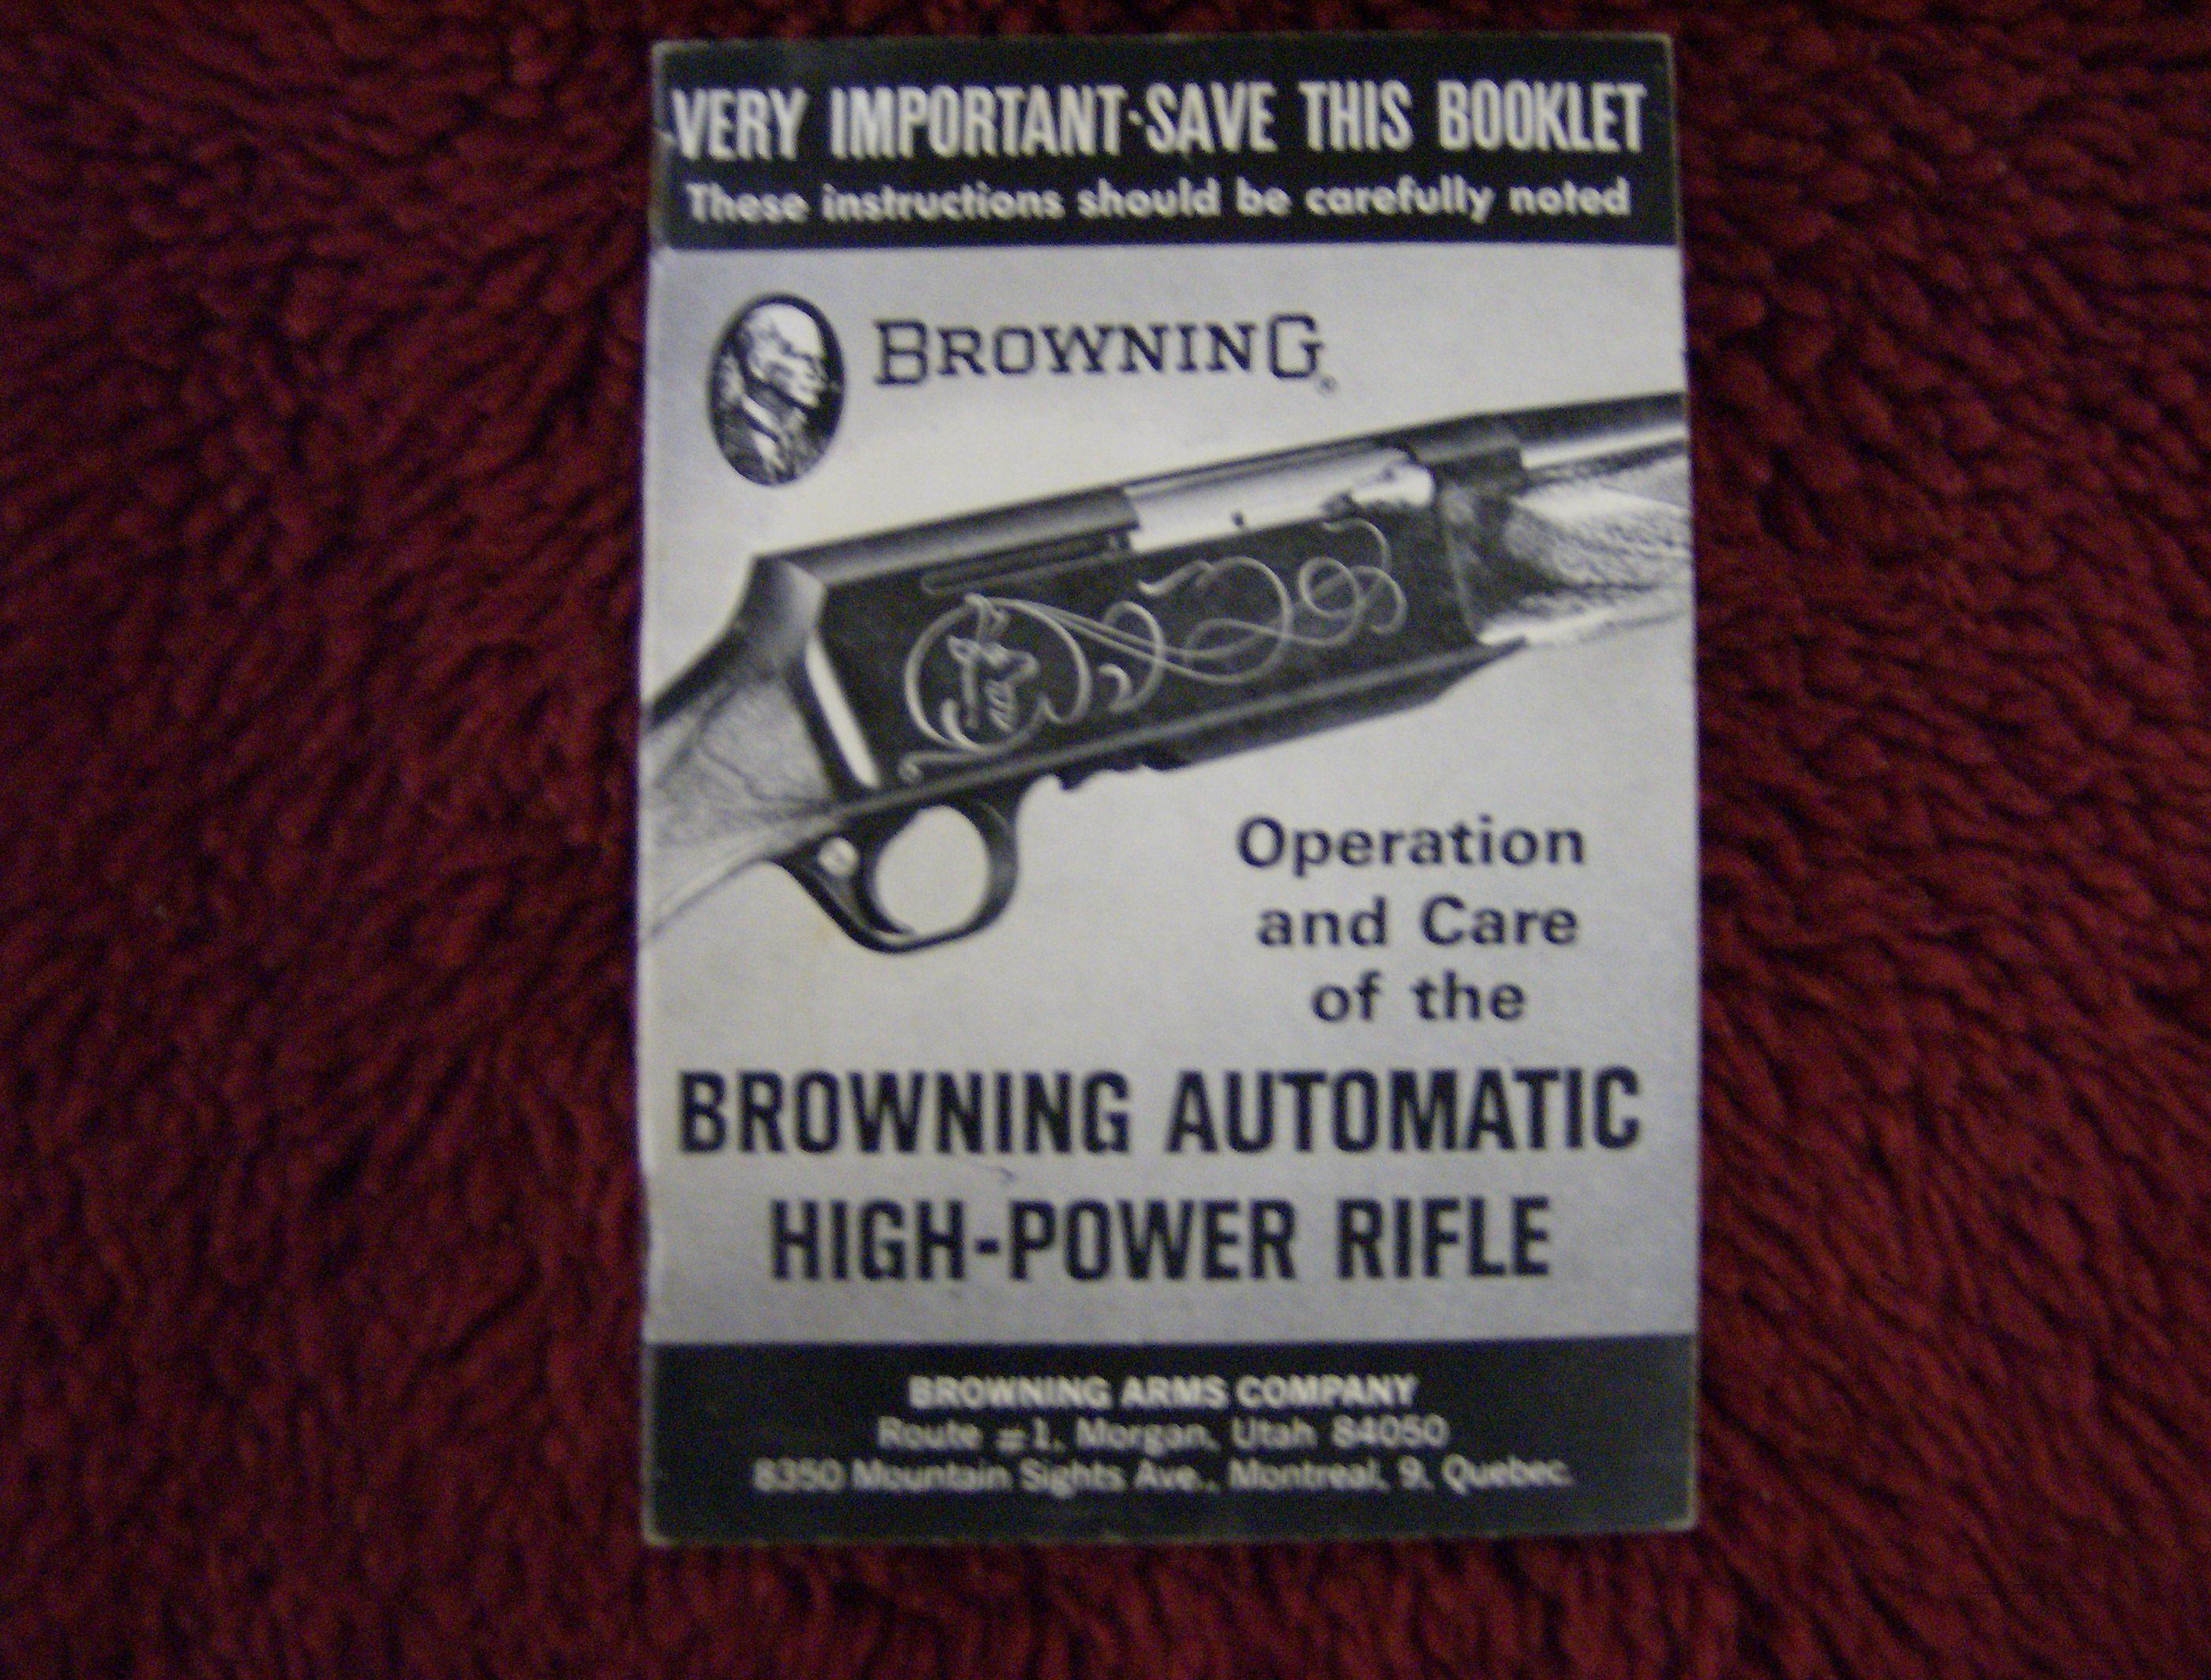 BROWNING OWNERS MANUAL FOR BAR RIFLE  Non-Guns > Manuals - Print